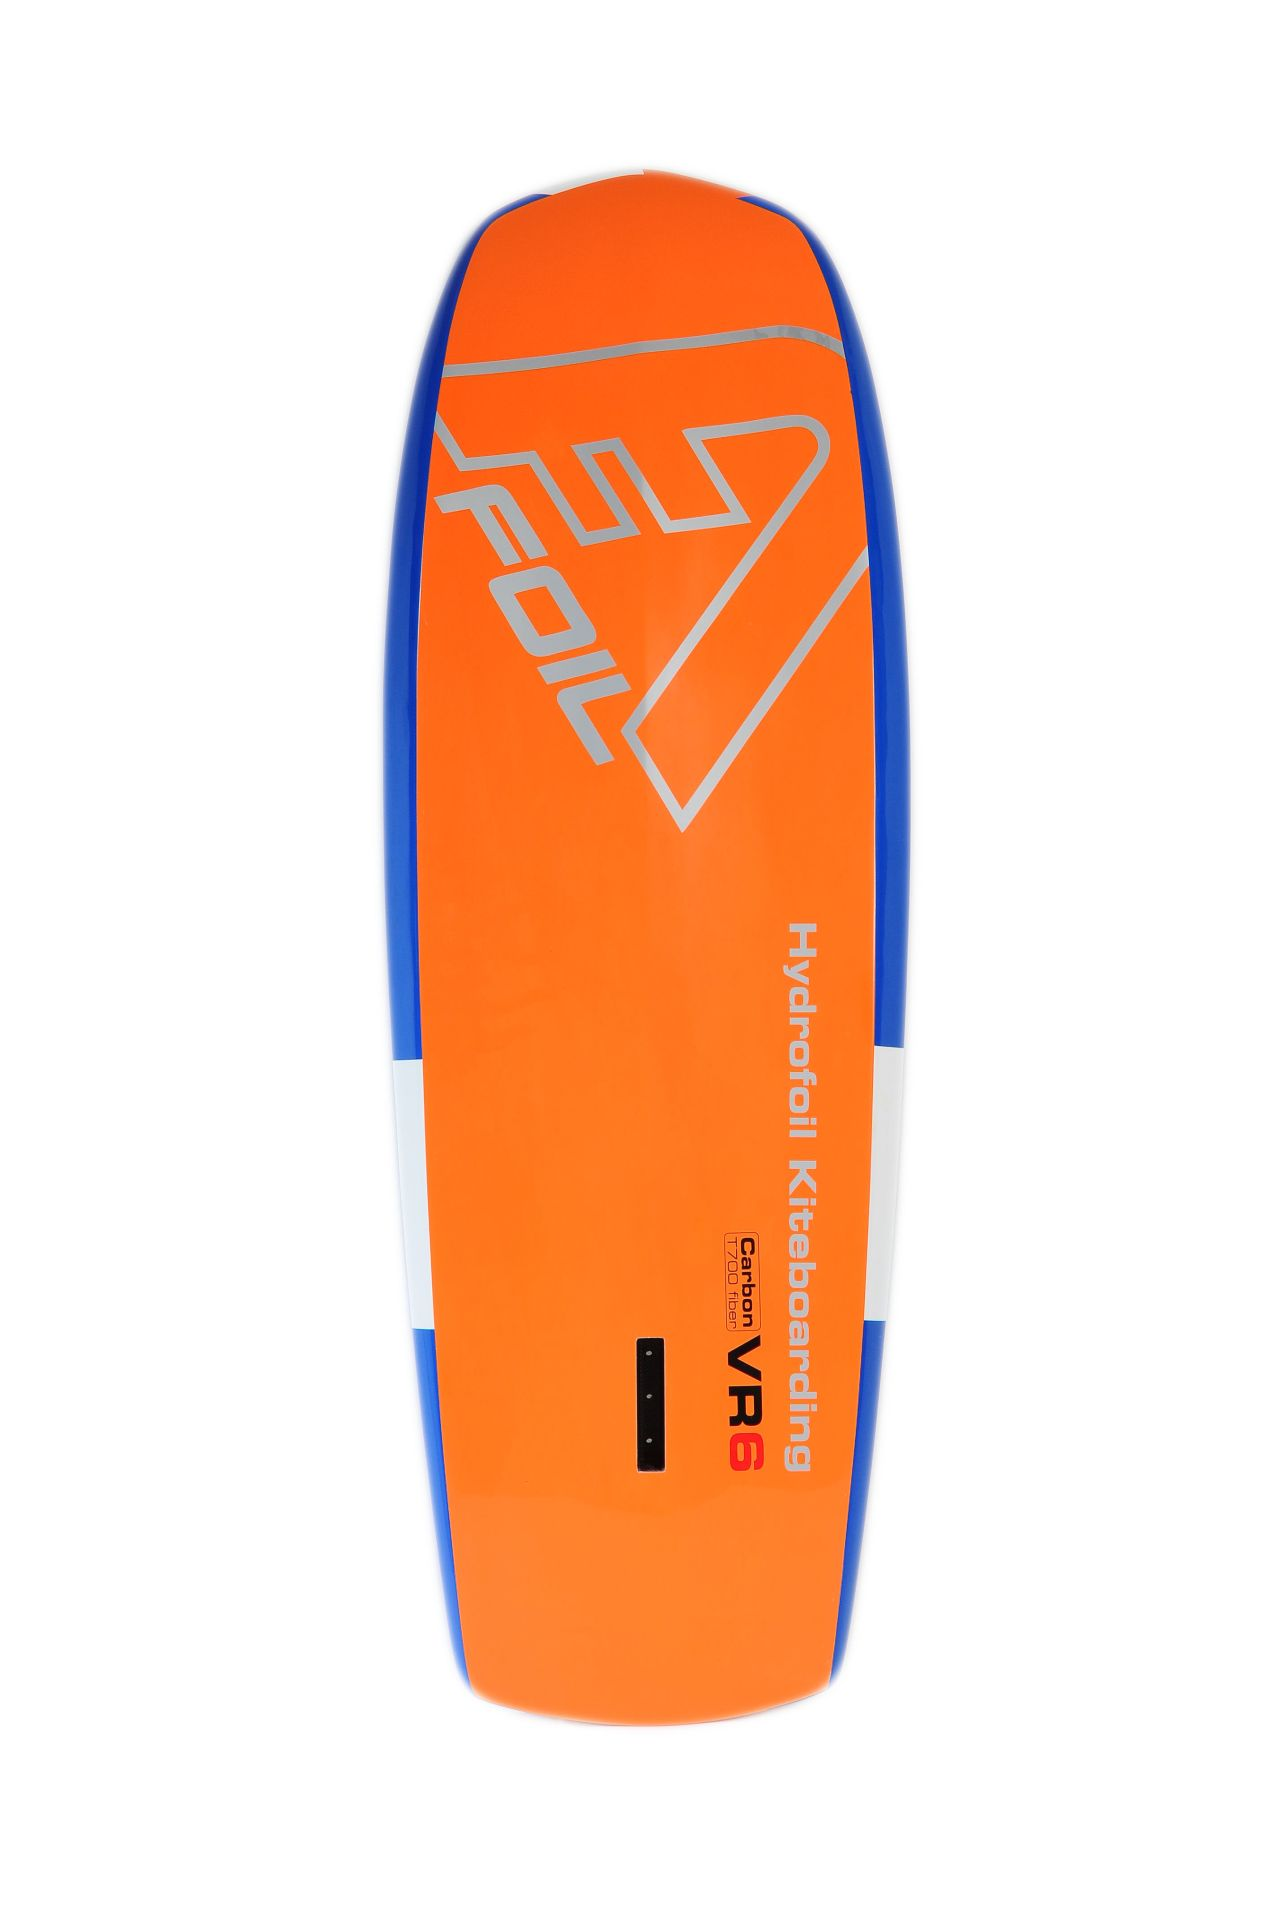 Kitefoil foilboard alpinefoil vr6 6 1